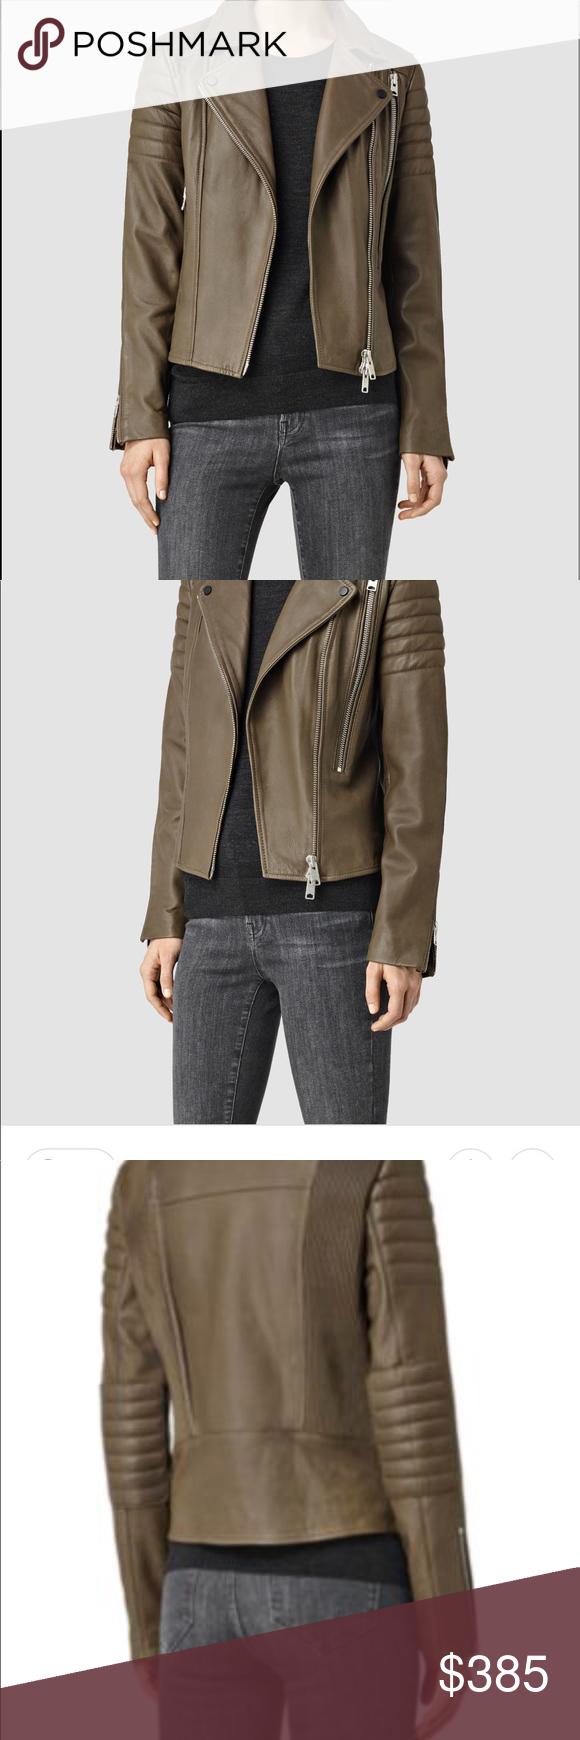 Allsaints Obika Leather Jacket Olive Green Leather Jacket Green Leather Jackets Leather Jacket [ 1740 x 580 Pixel ]